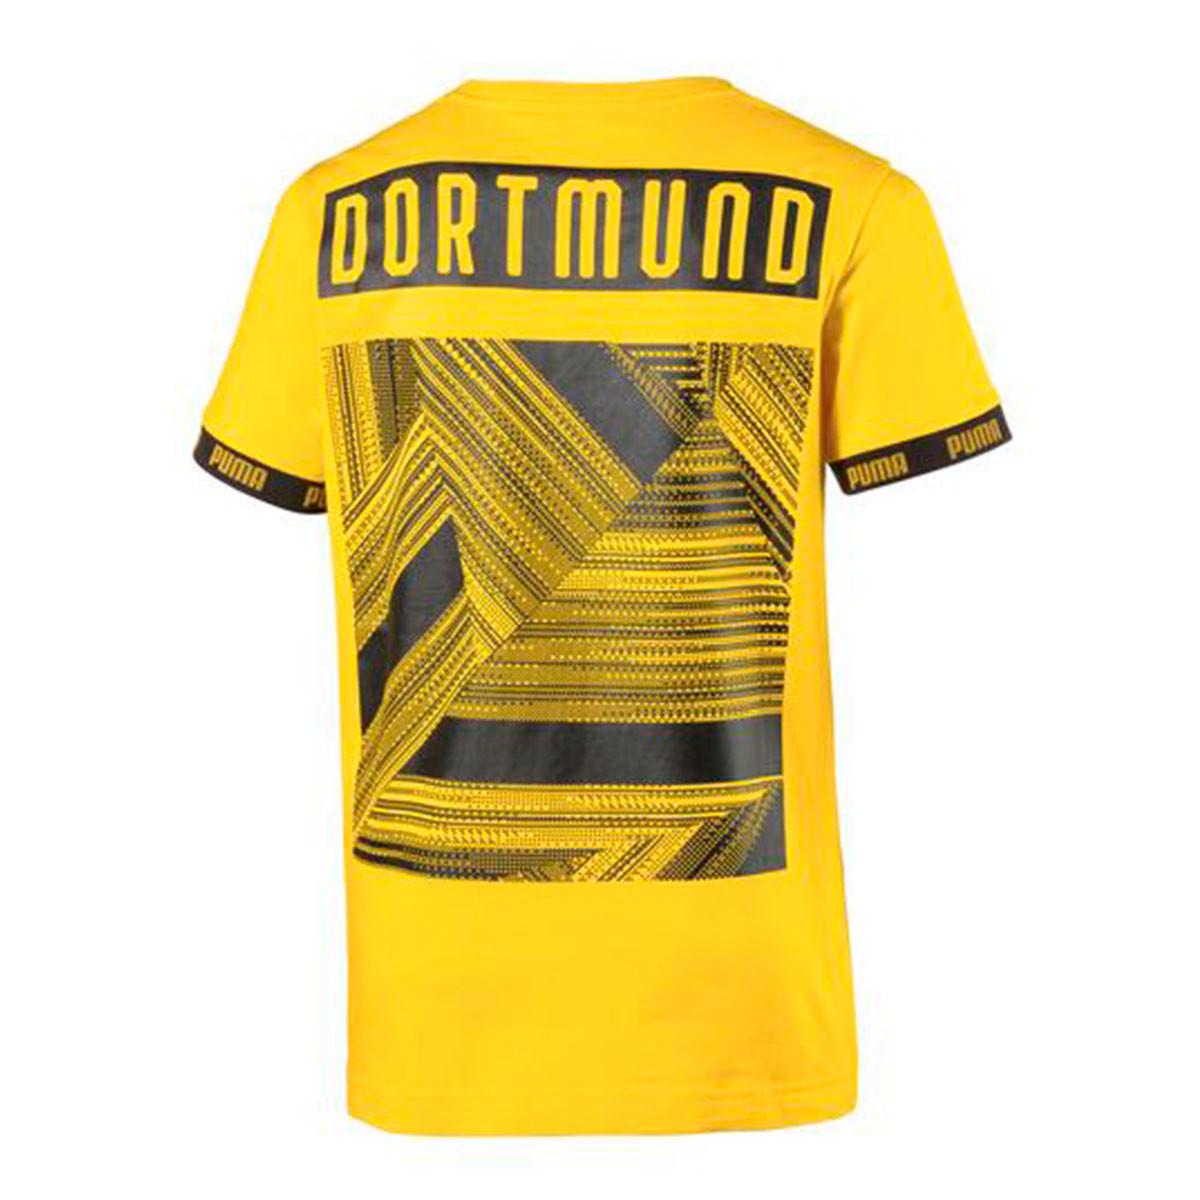 newest 7872e 6d4c3 Camiseta BVB FtblCulture 2019-2020 Cyber yellow